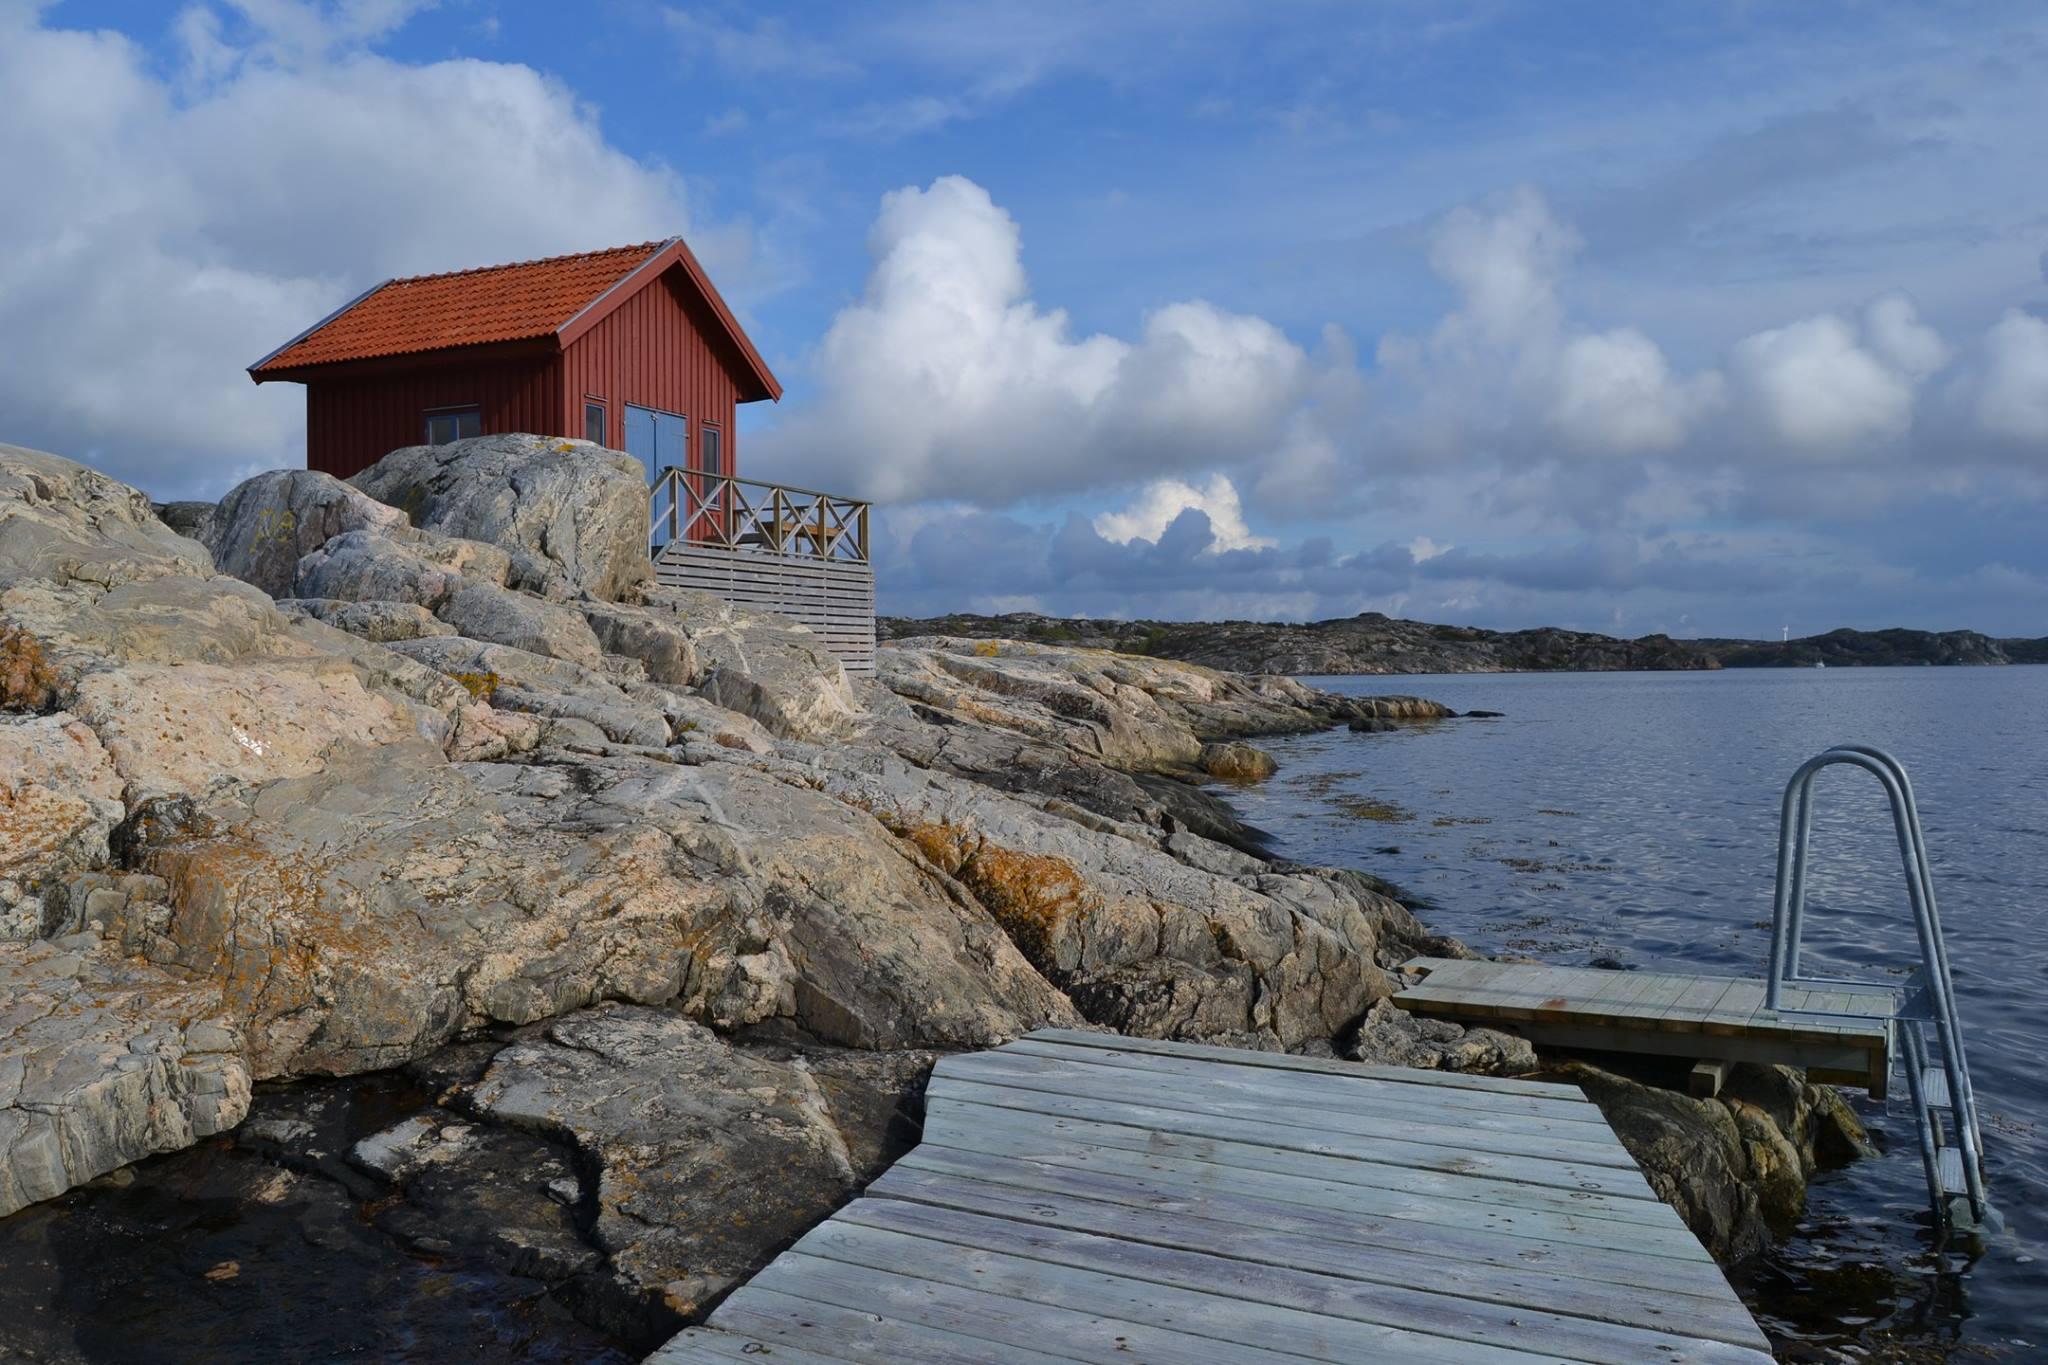 Schwedische Tapeten G?nstig : Color 10 Liter Holzfarbe Ral 3005 Weinrot Imparat Juwel Color 10